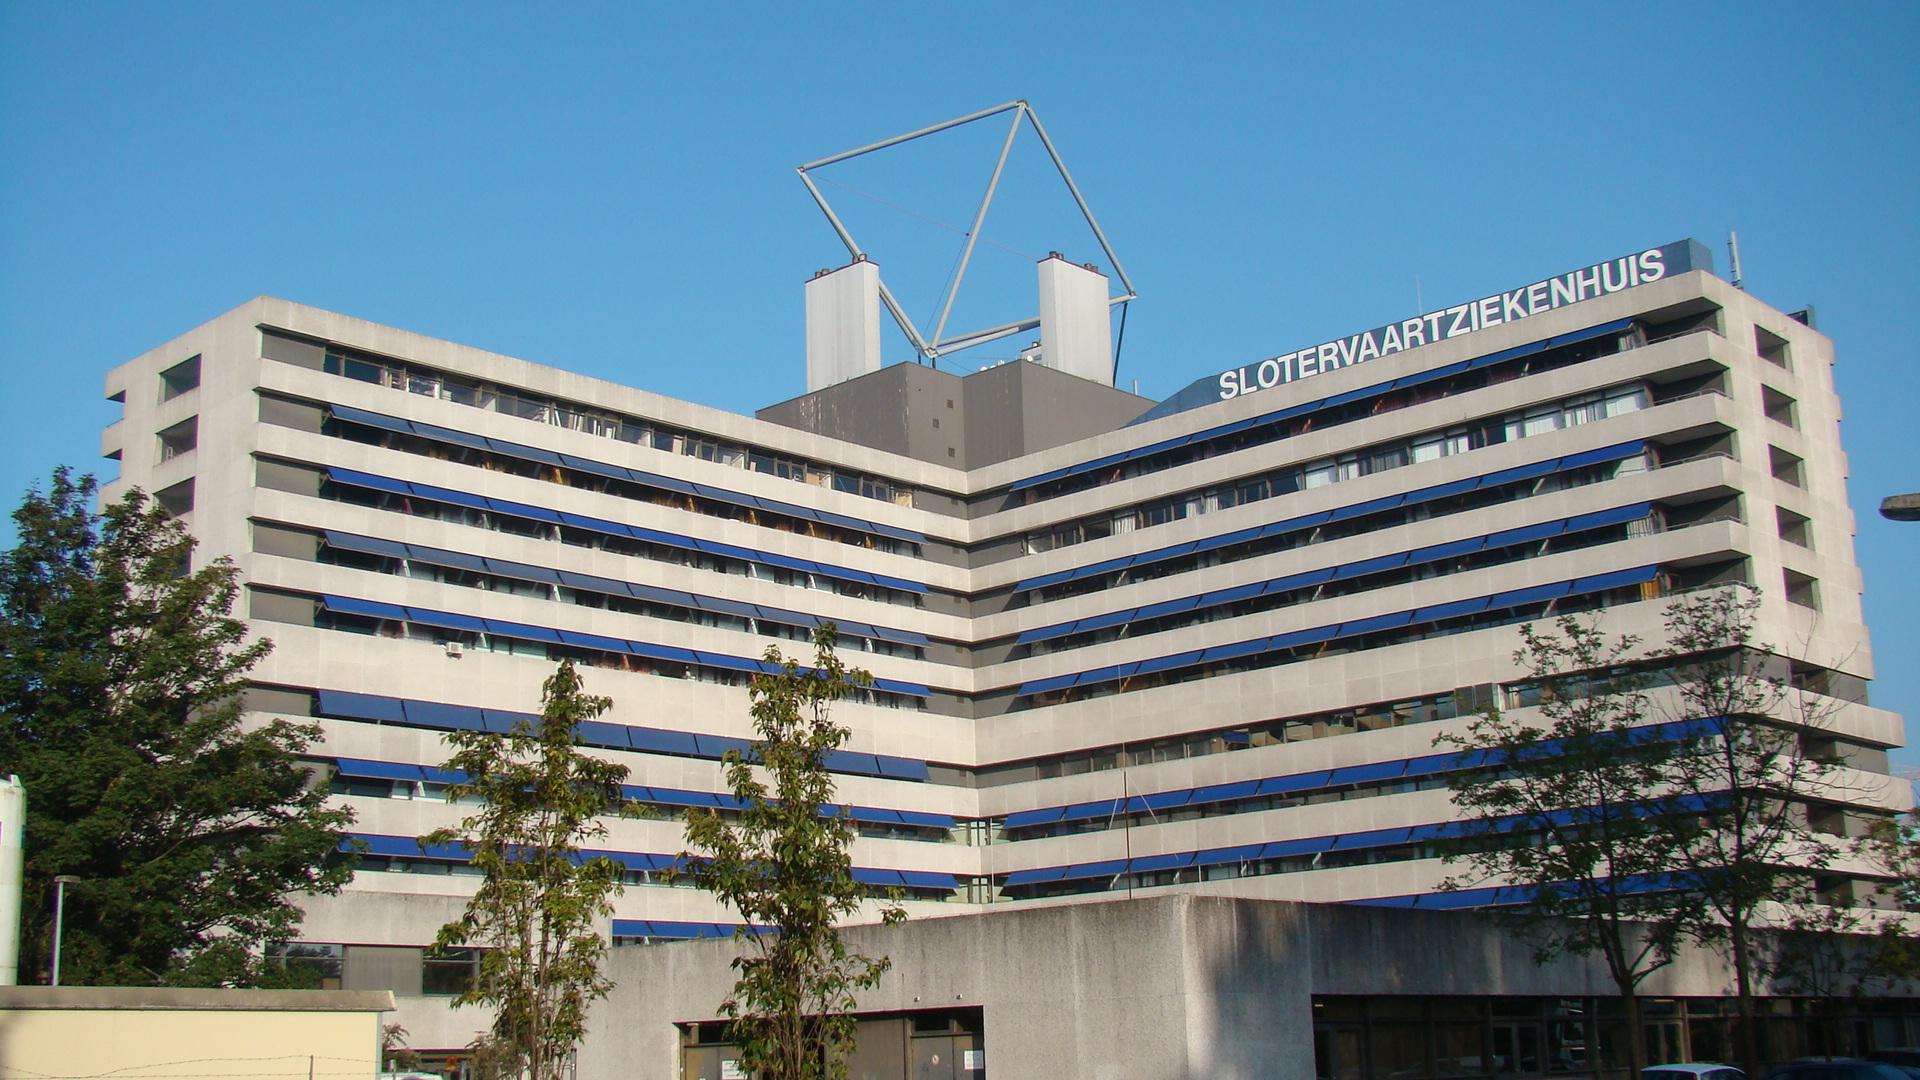 Image Result For Mc Slotervaart